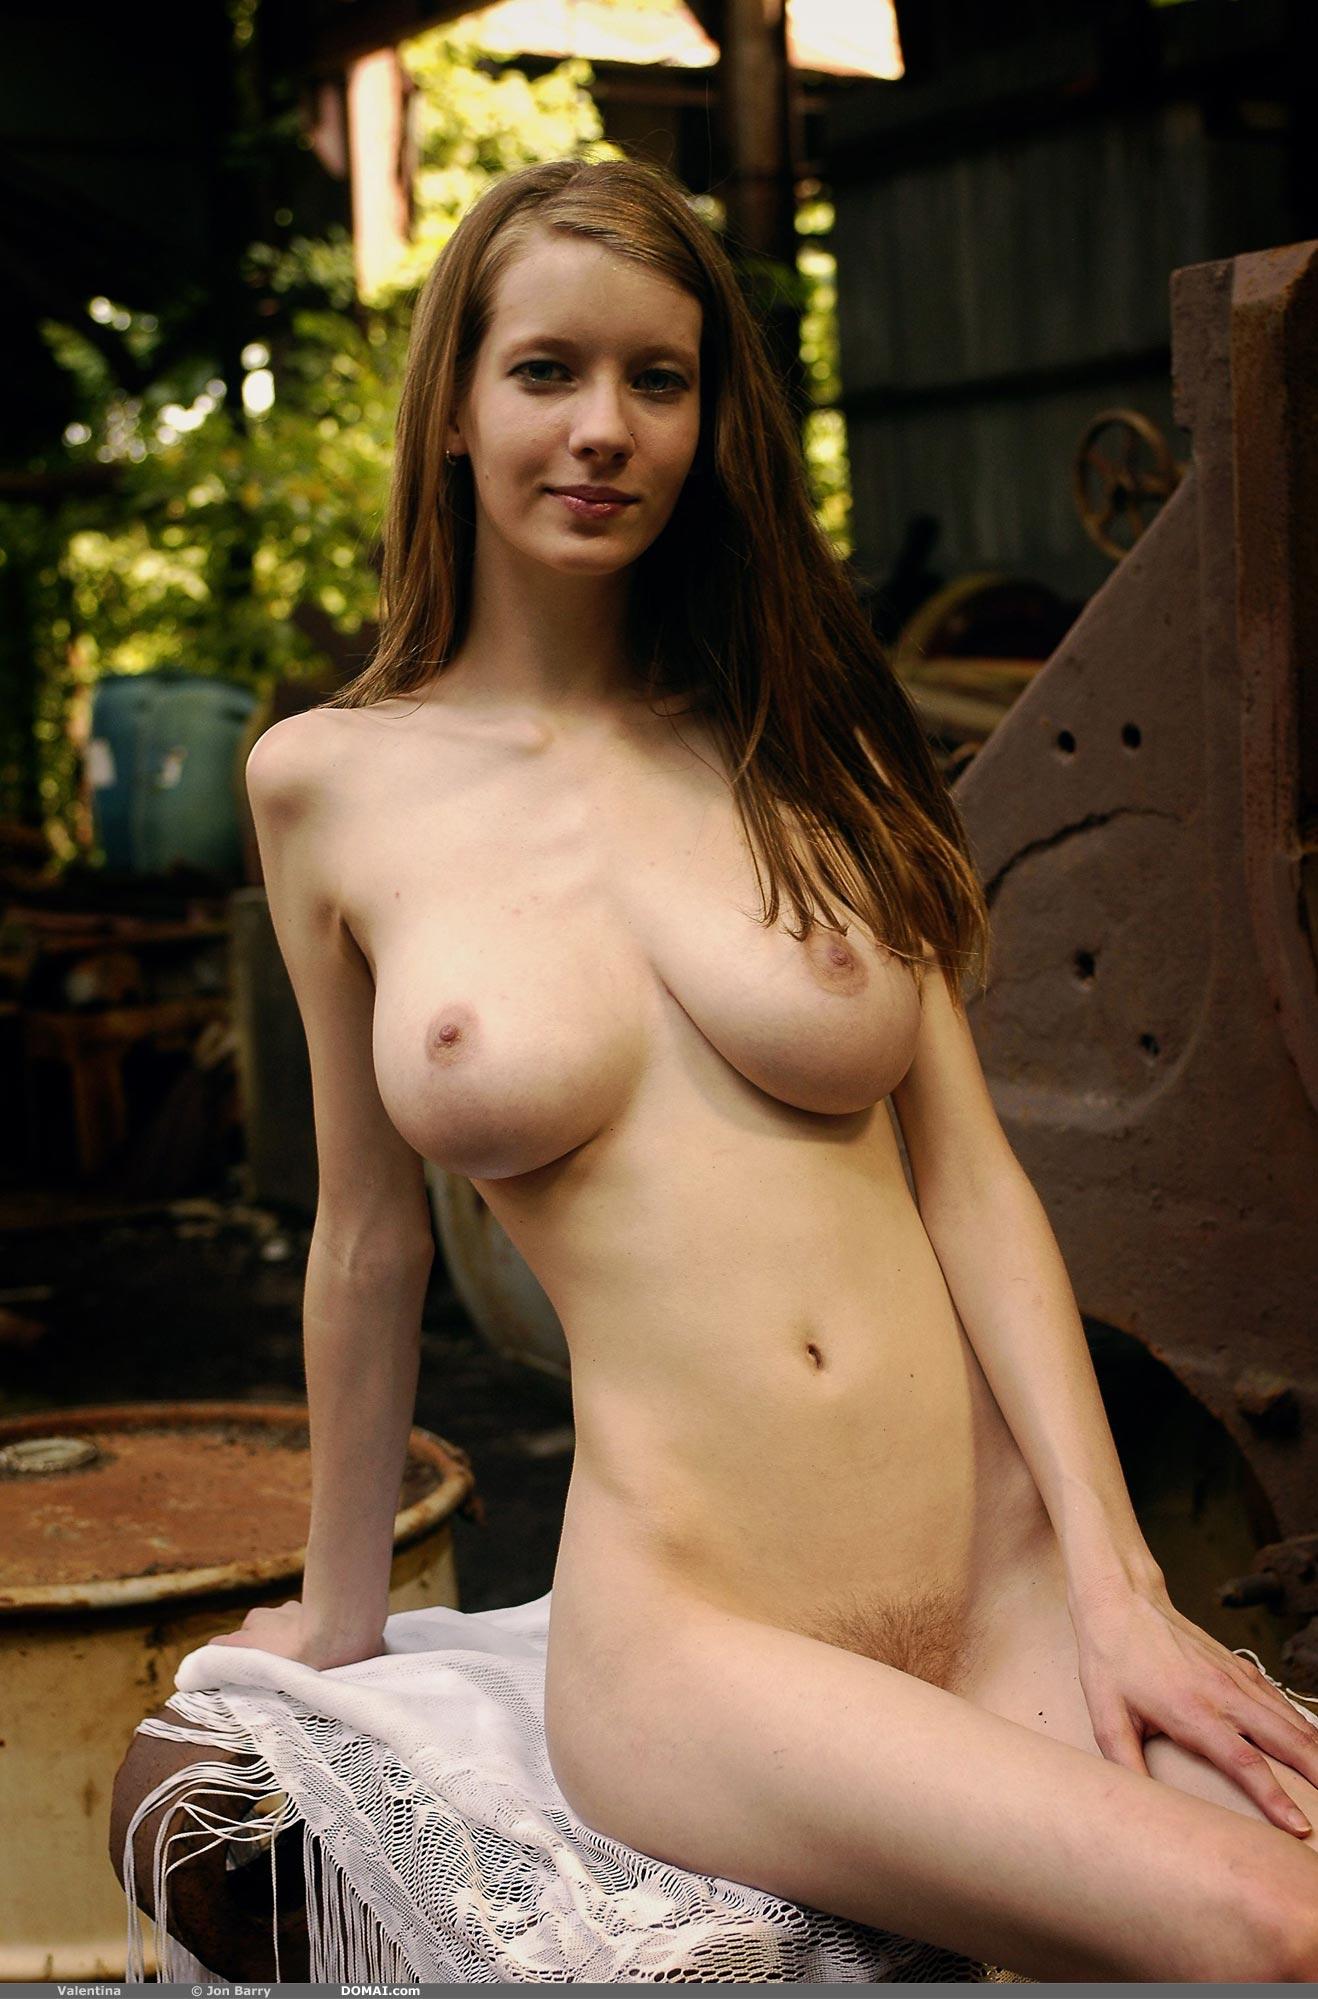 Tits slim body big Big Boobs